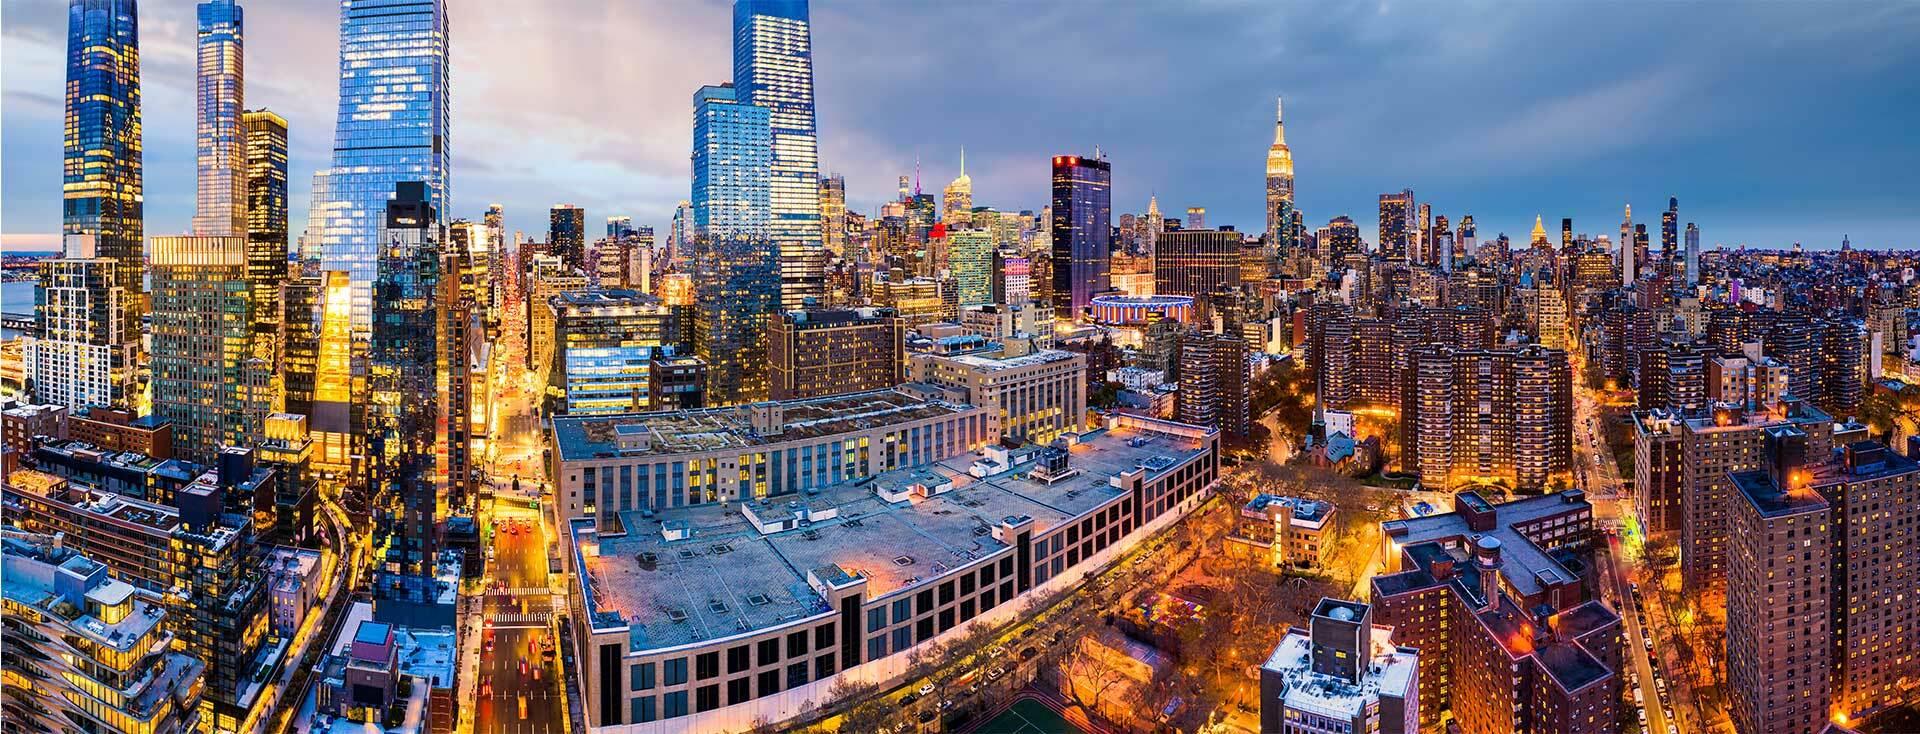 Hudson yards new york